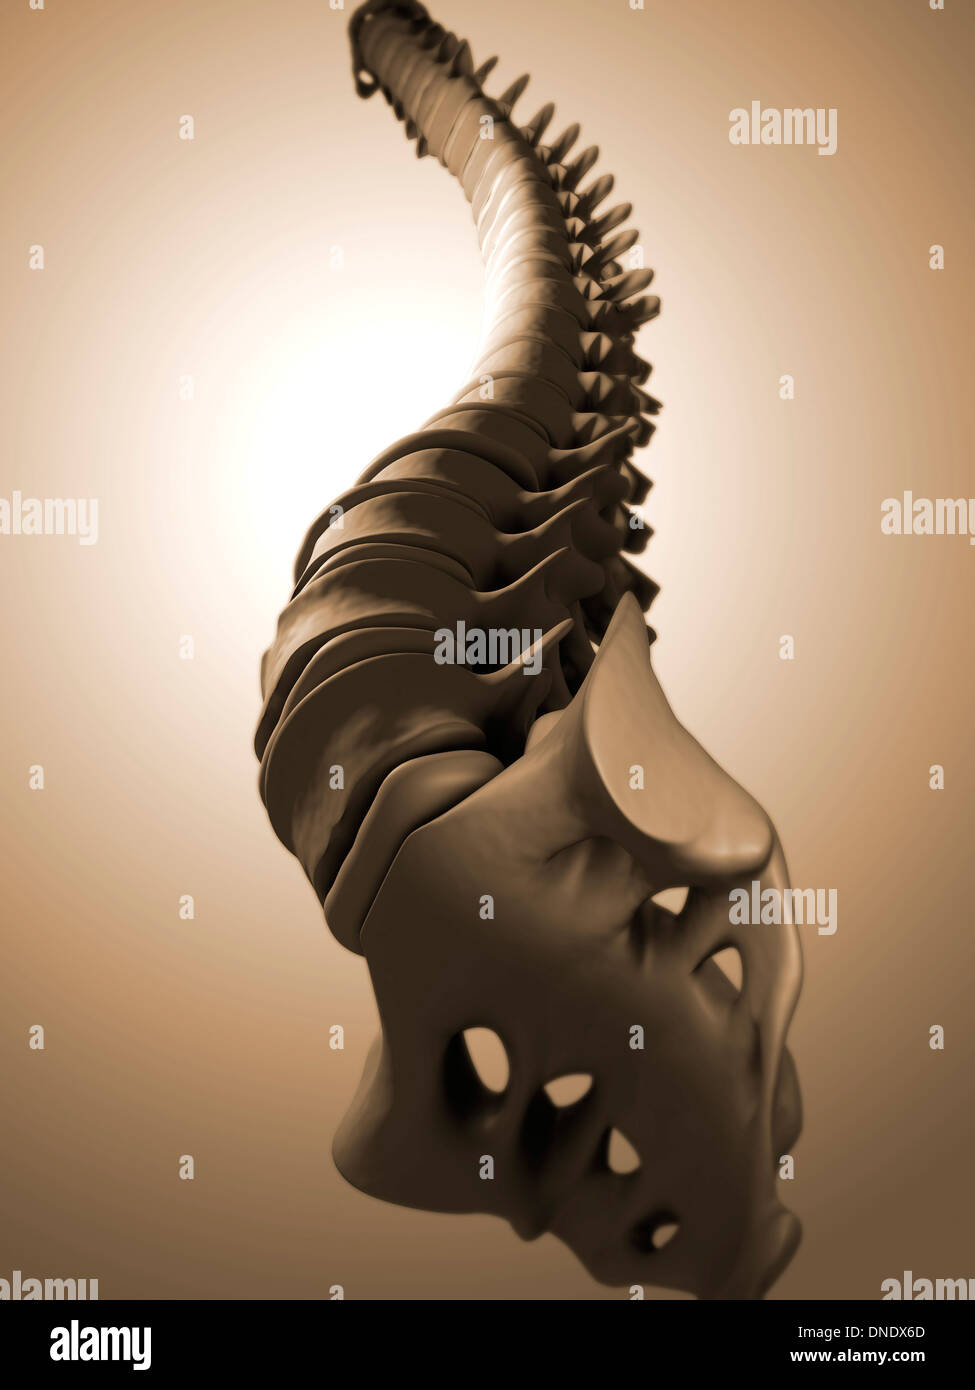 Conceptual image of human backbone. - Stock Image